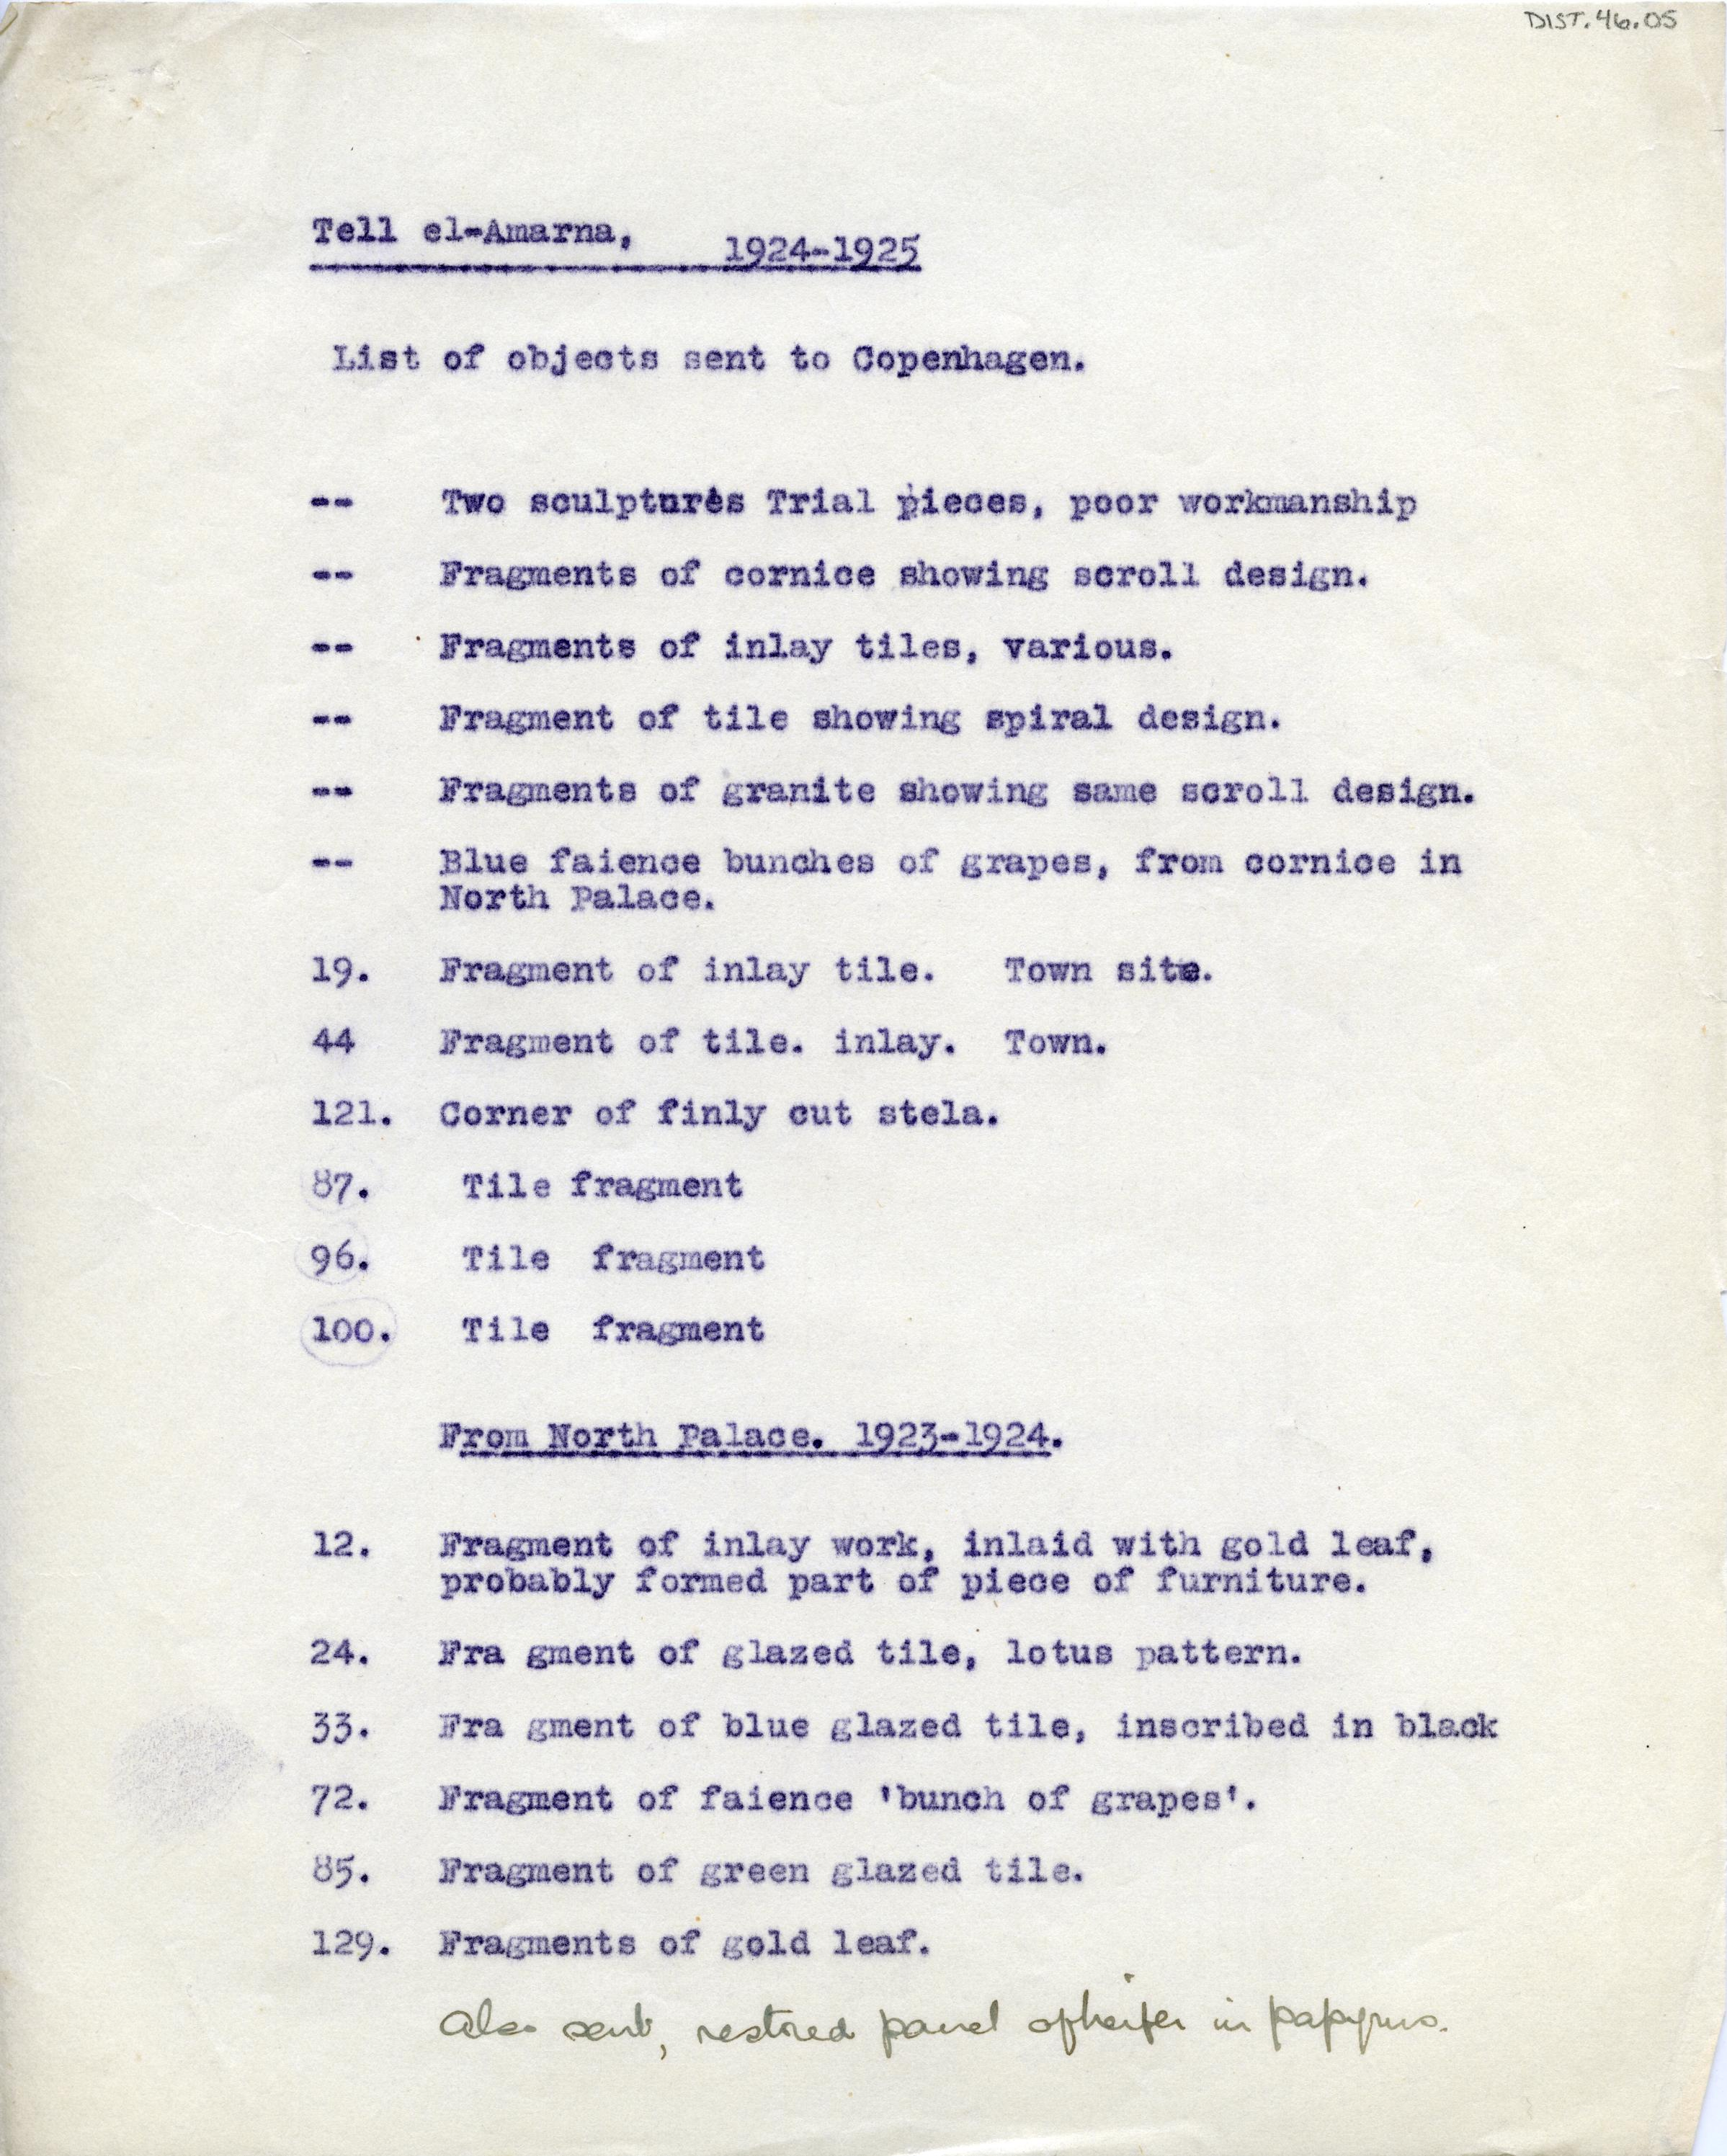 1921-25 el-Amarna DIST.46.05